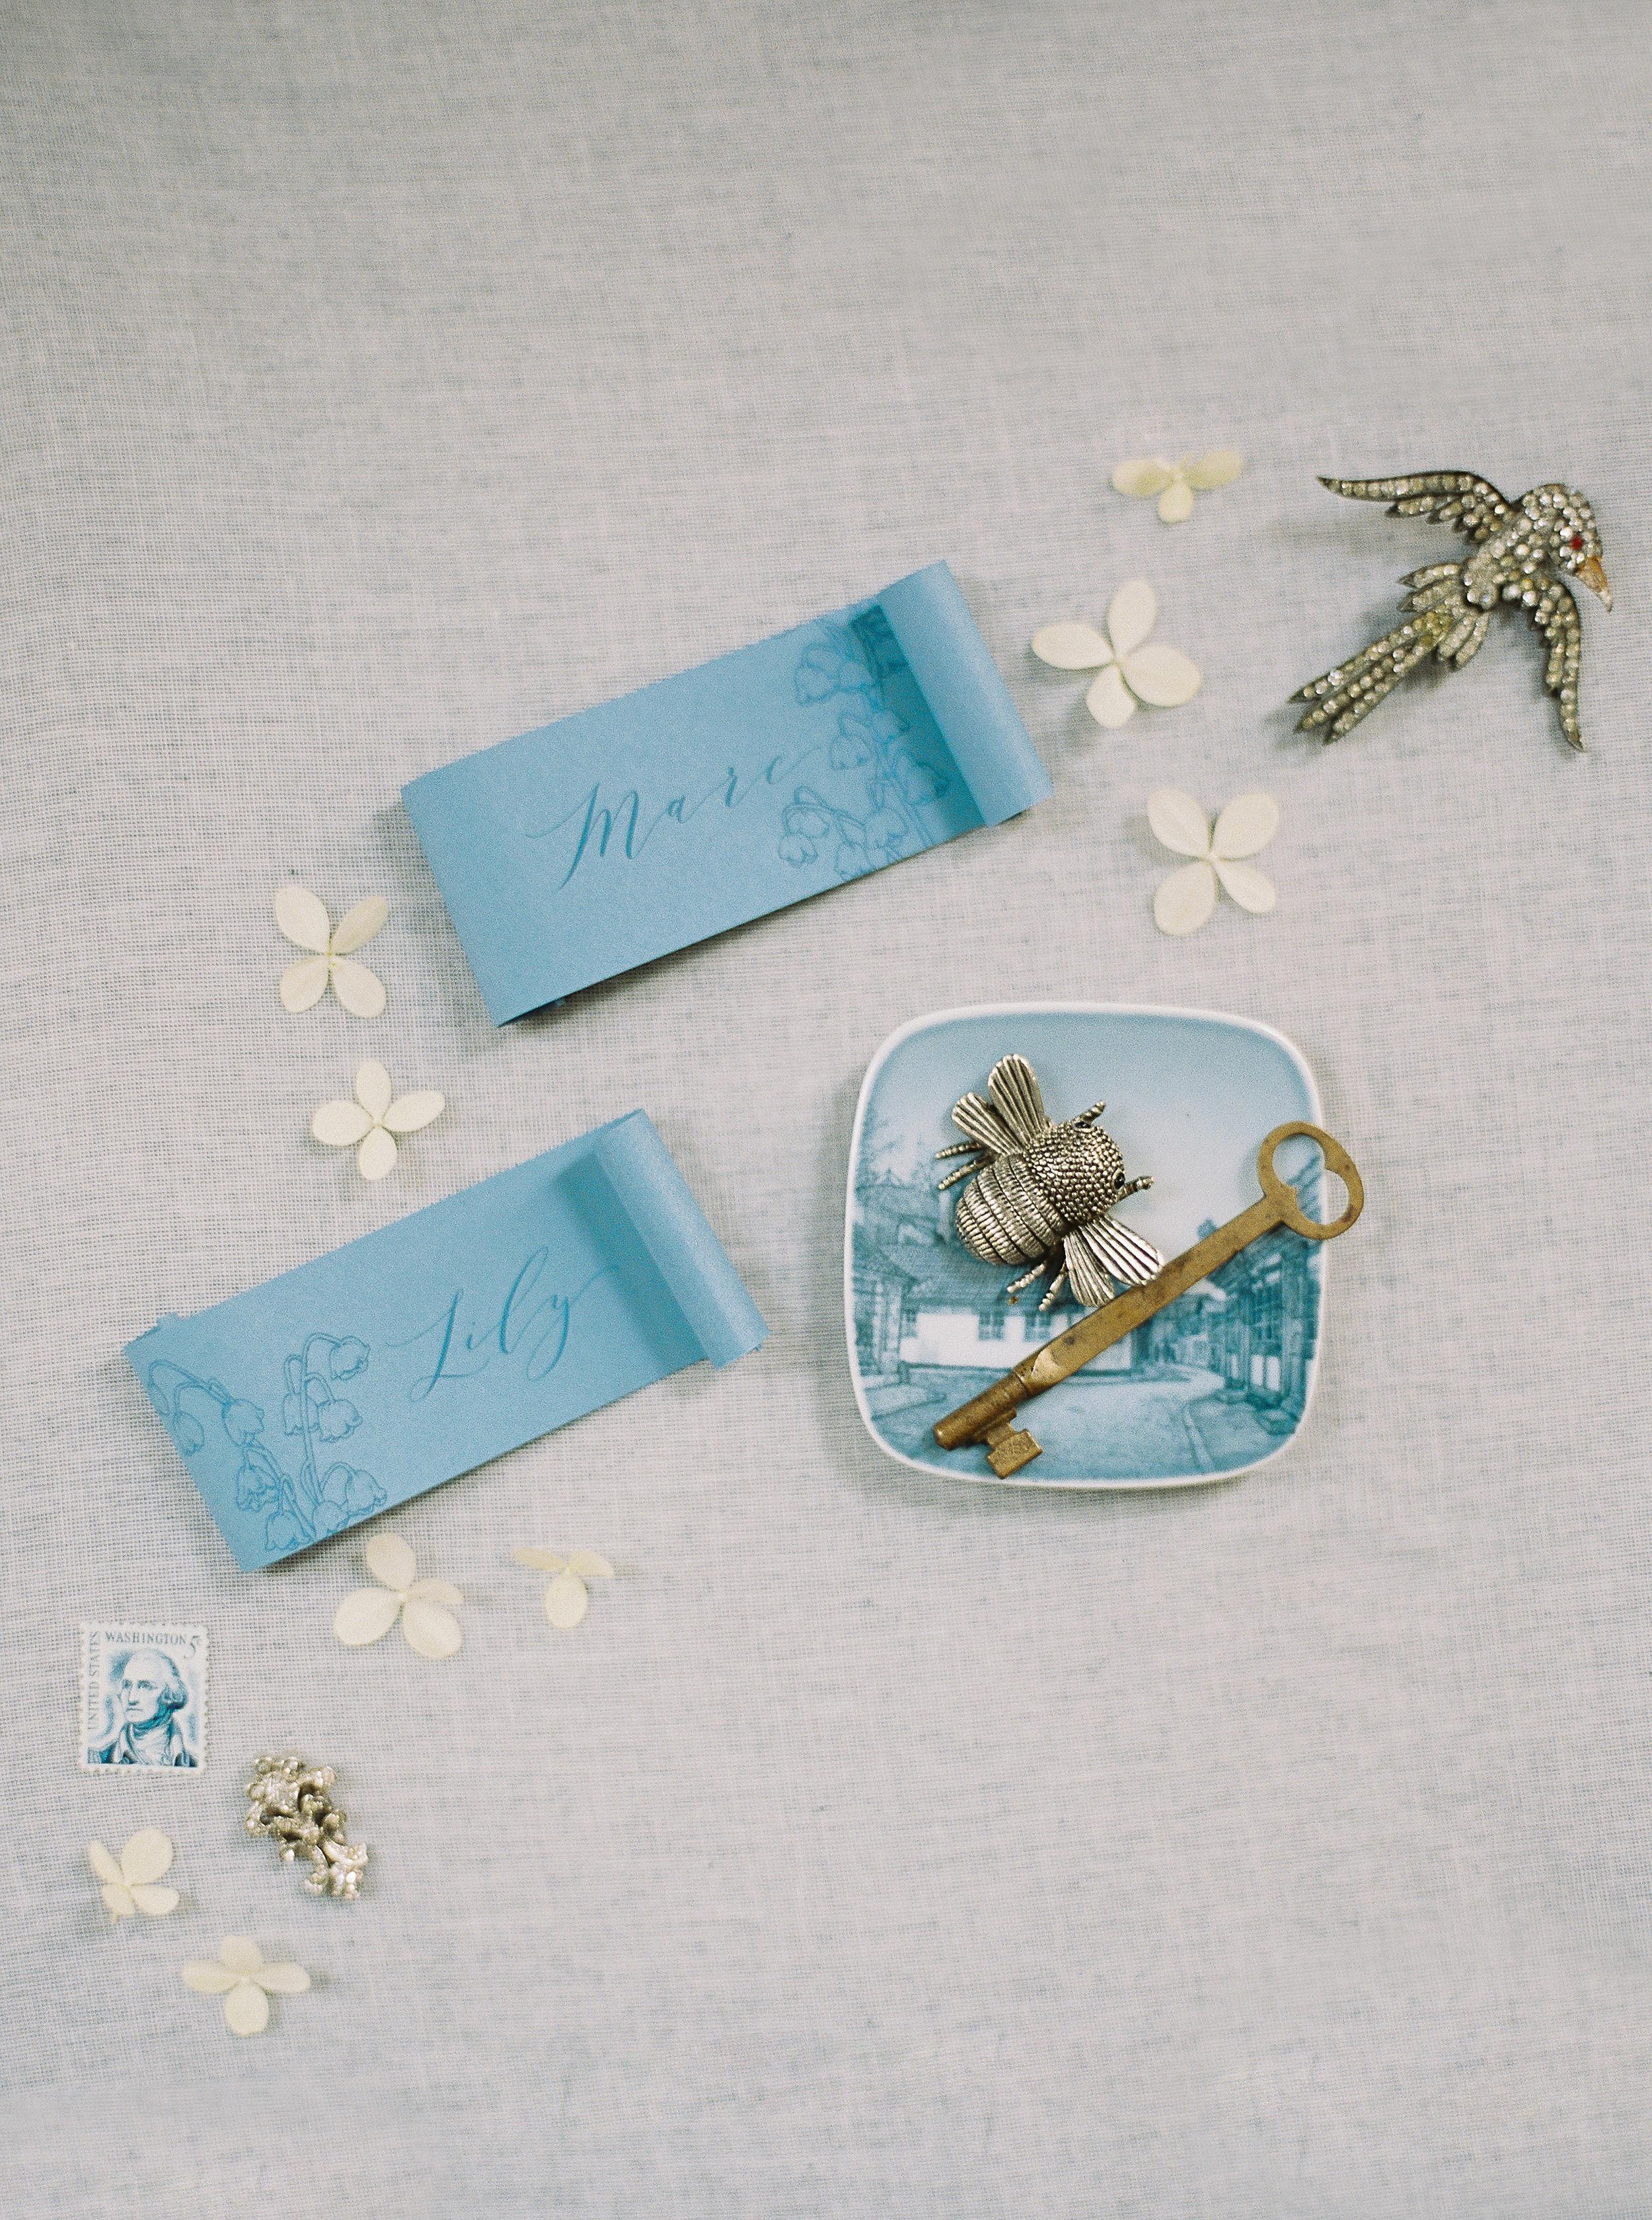 Alexandra-Elise-Photography-Film-Branding-Photographer-Rochester-New-York-Stone-Fruit-Studio-Wedding-Invitations-012.jpg